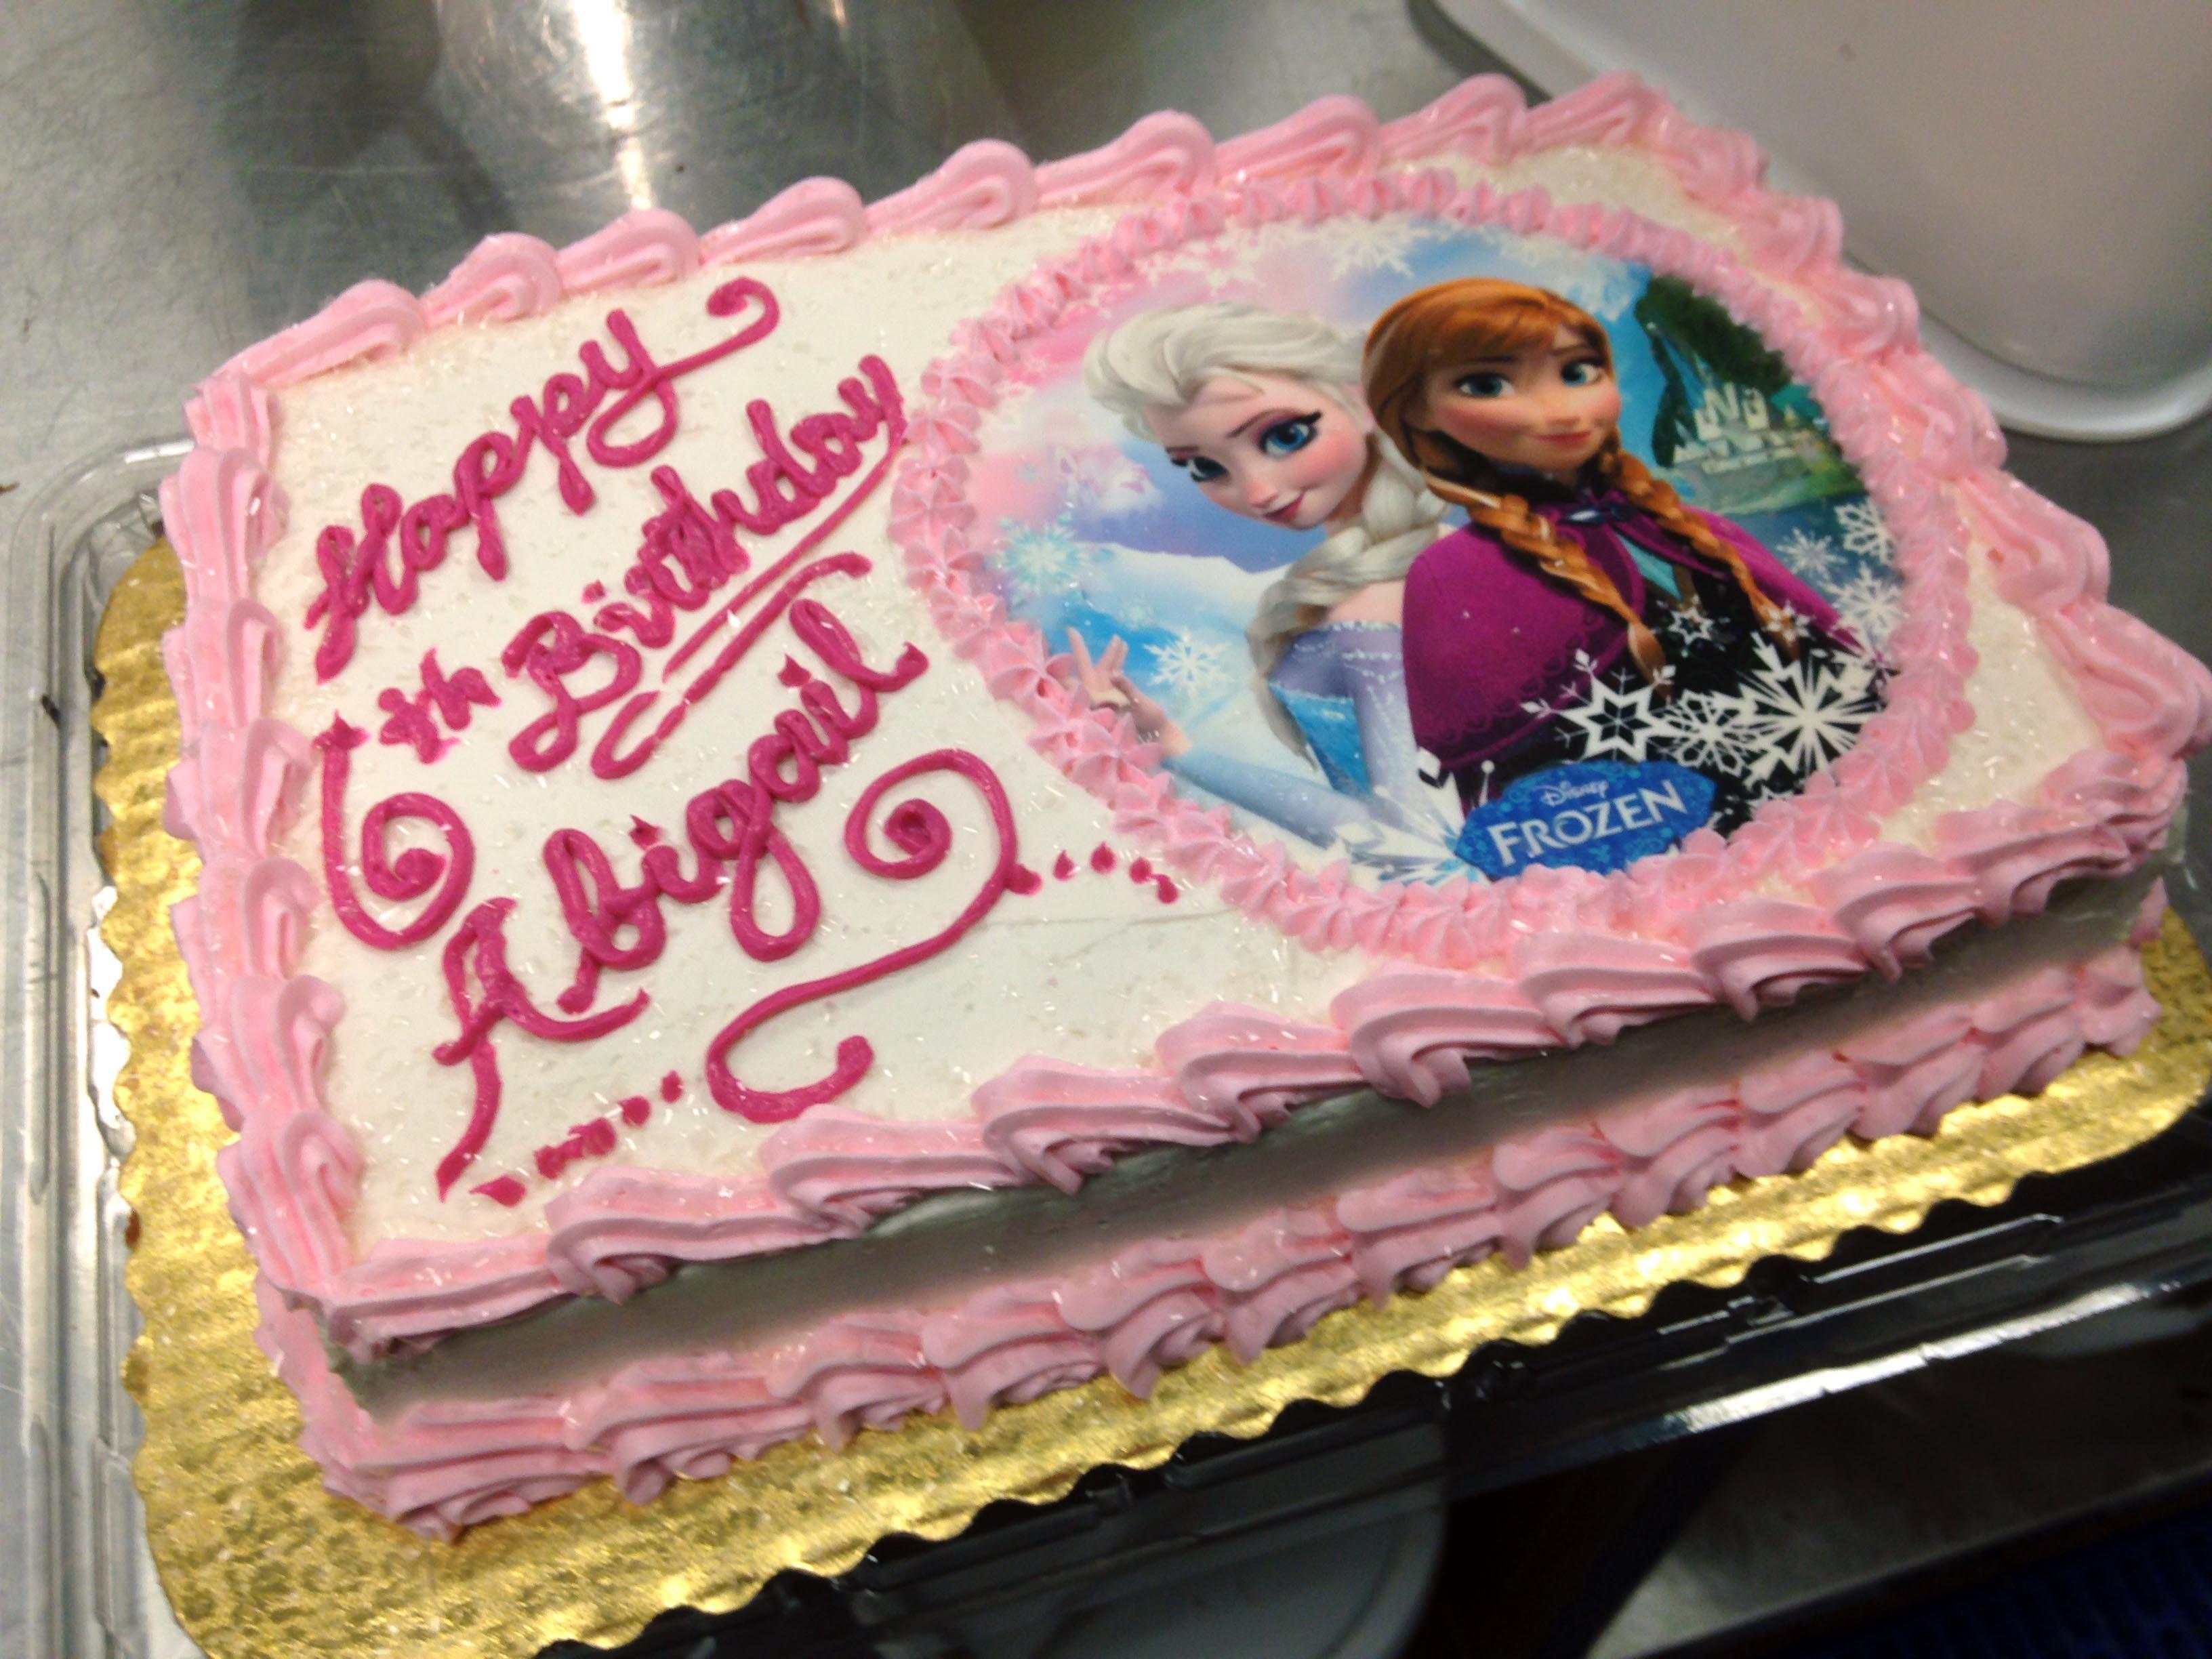 Frozen Birthday Sheet Cake Google Search Birthday Sheet Cakes Bakery Cakes Birthday Cake Bakery